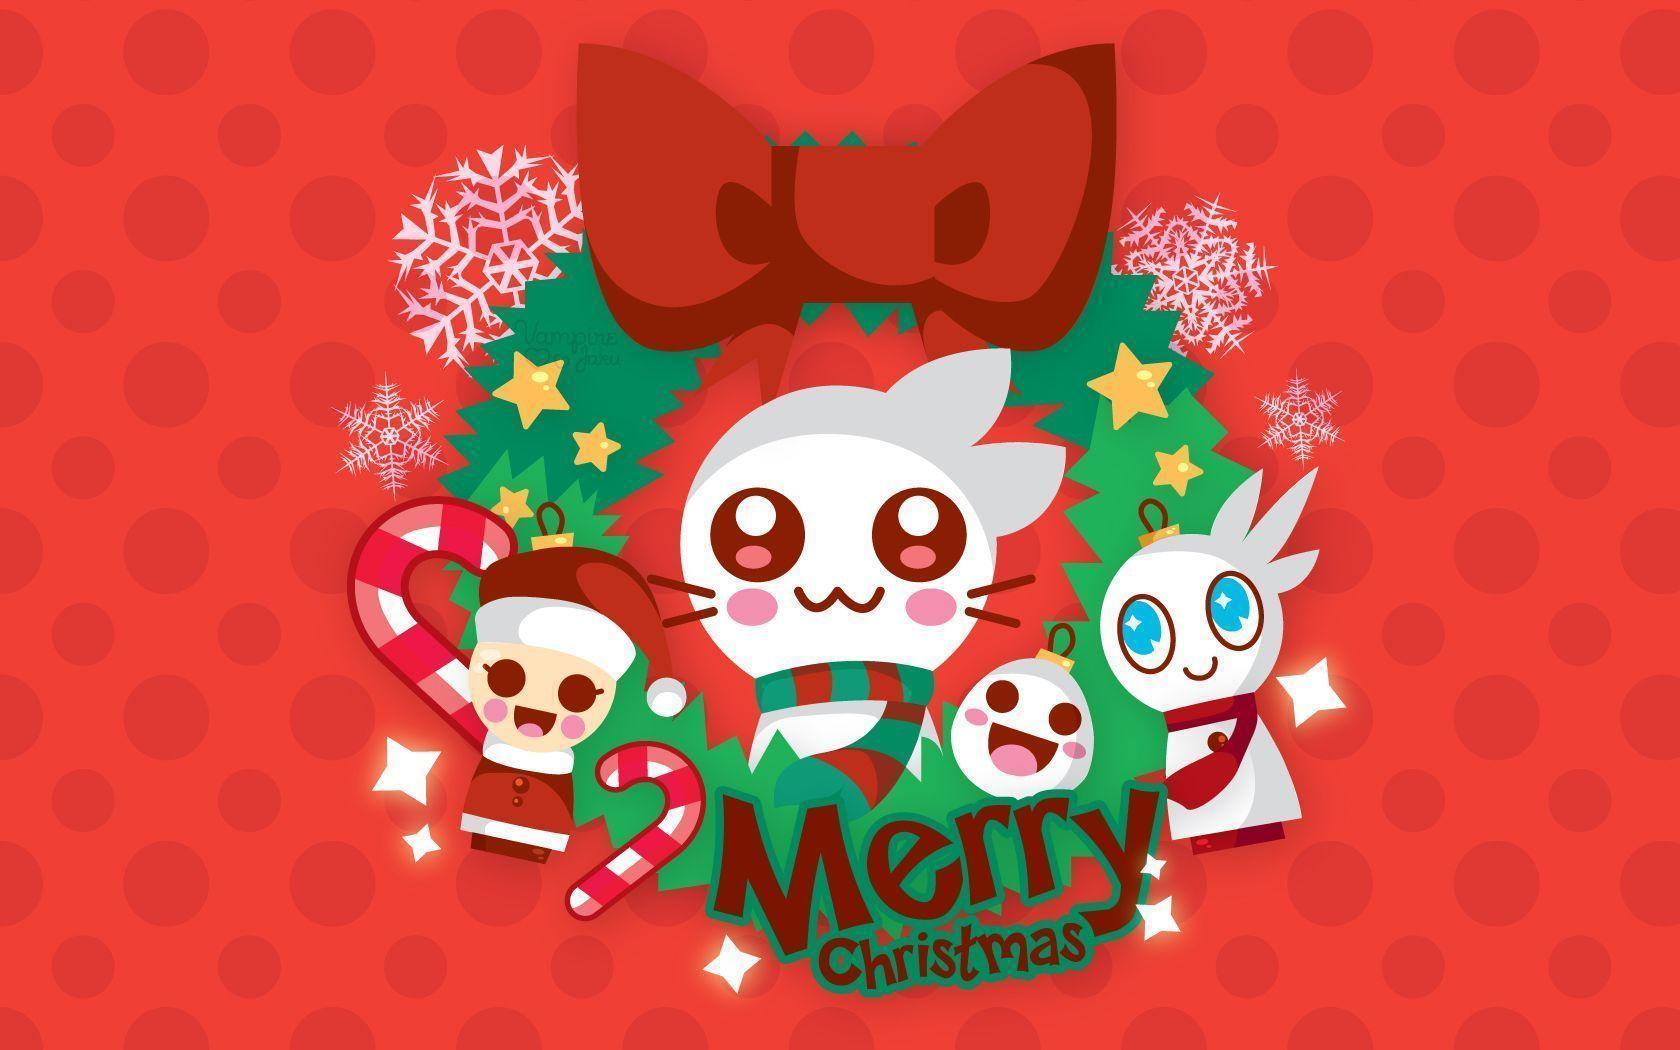 Fondos Navidad Animados: Pokemon Christmas Wallpapers